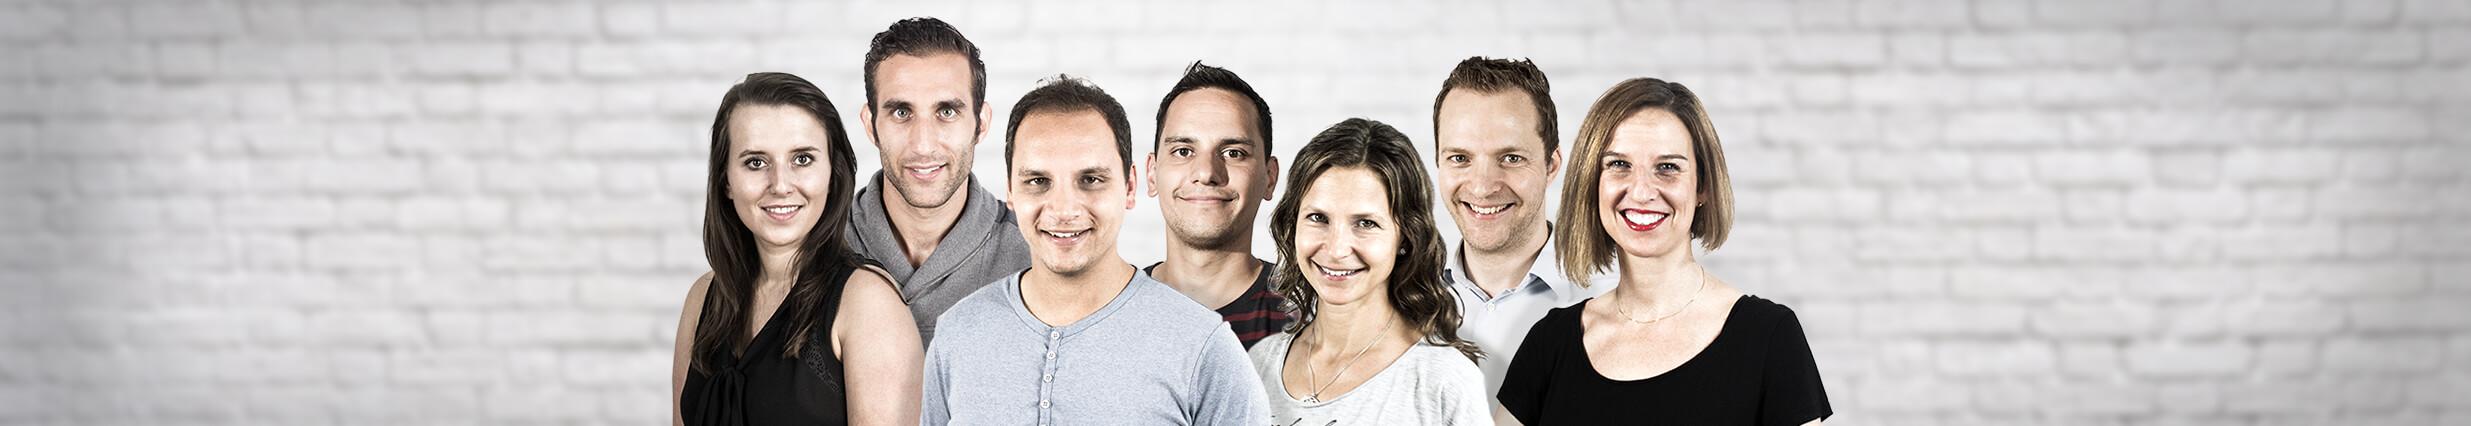 Friseur-Job.de - Team